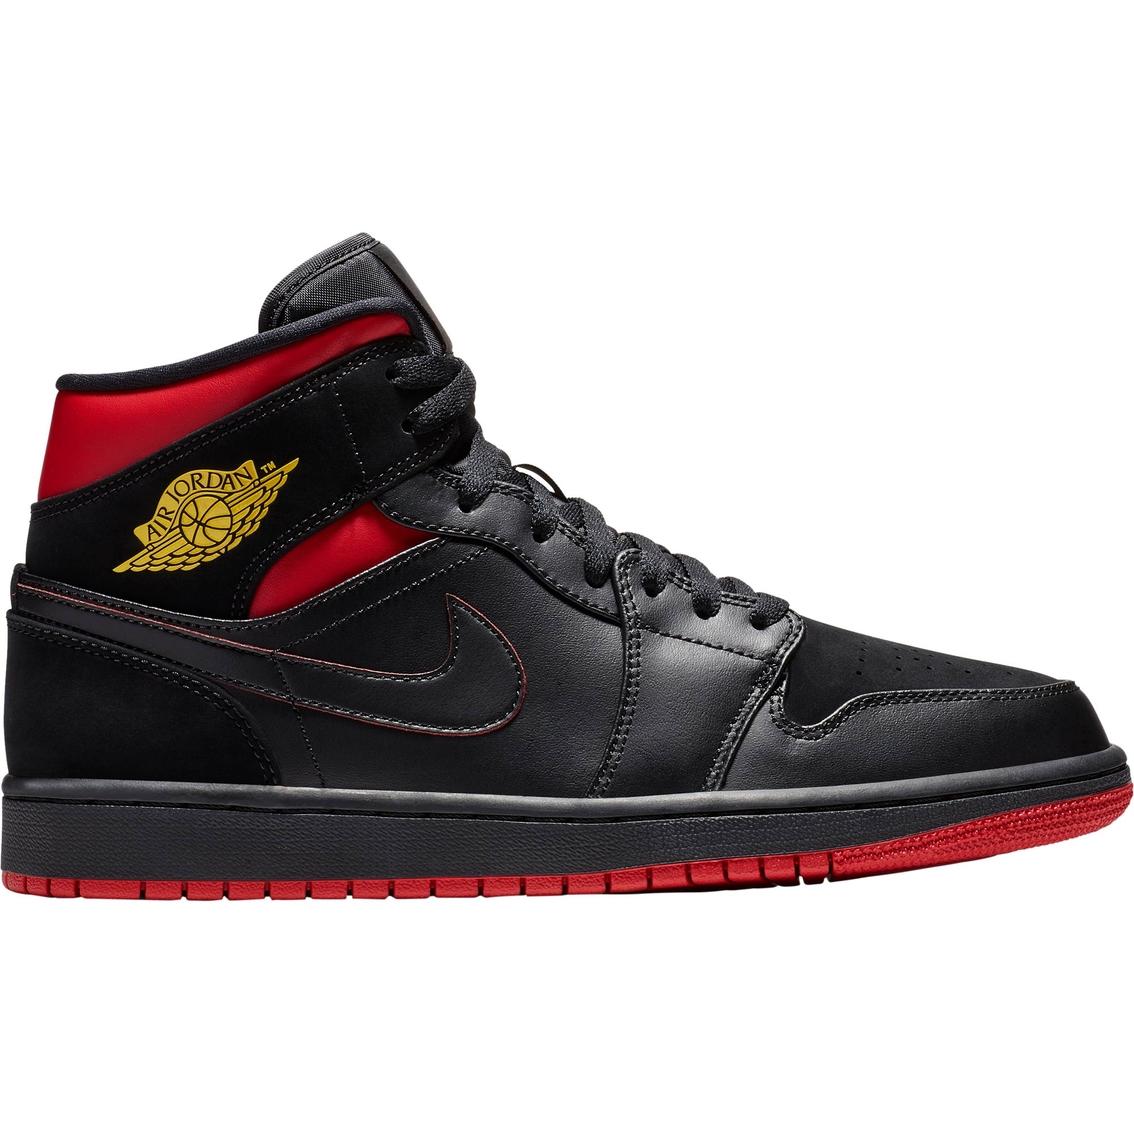 67dd199c09c9 Jordan Men s Air Jordan 1 Mid Basketball Shoes